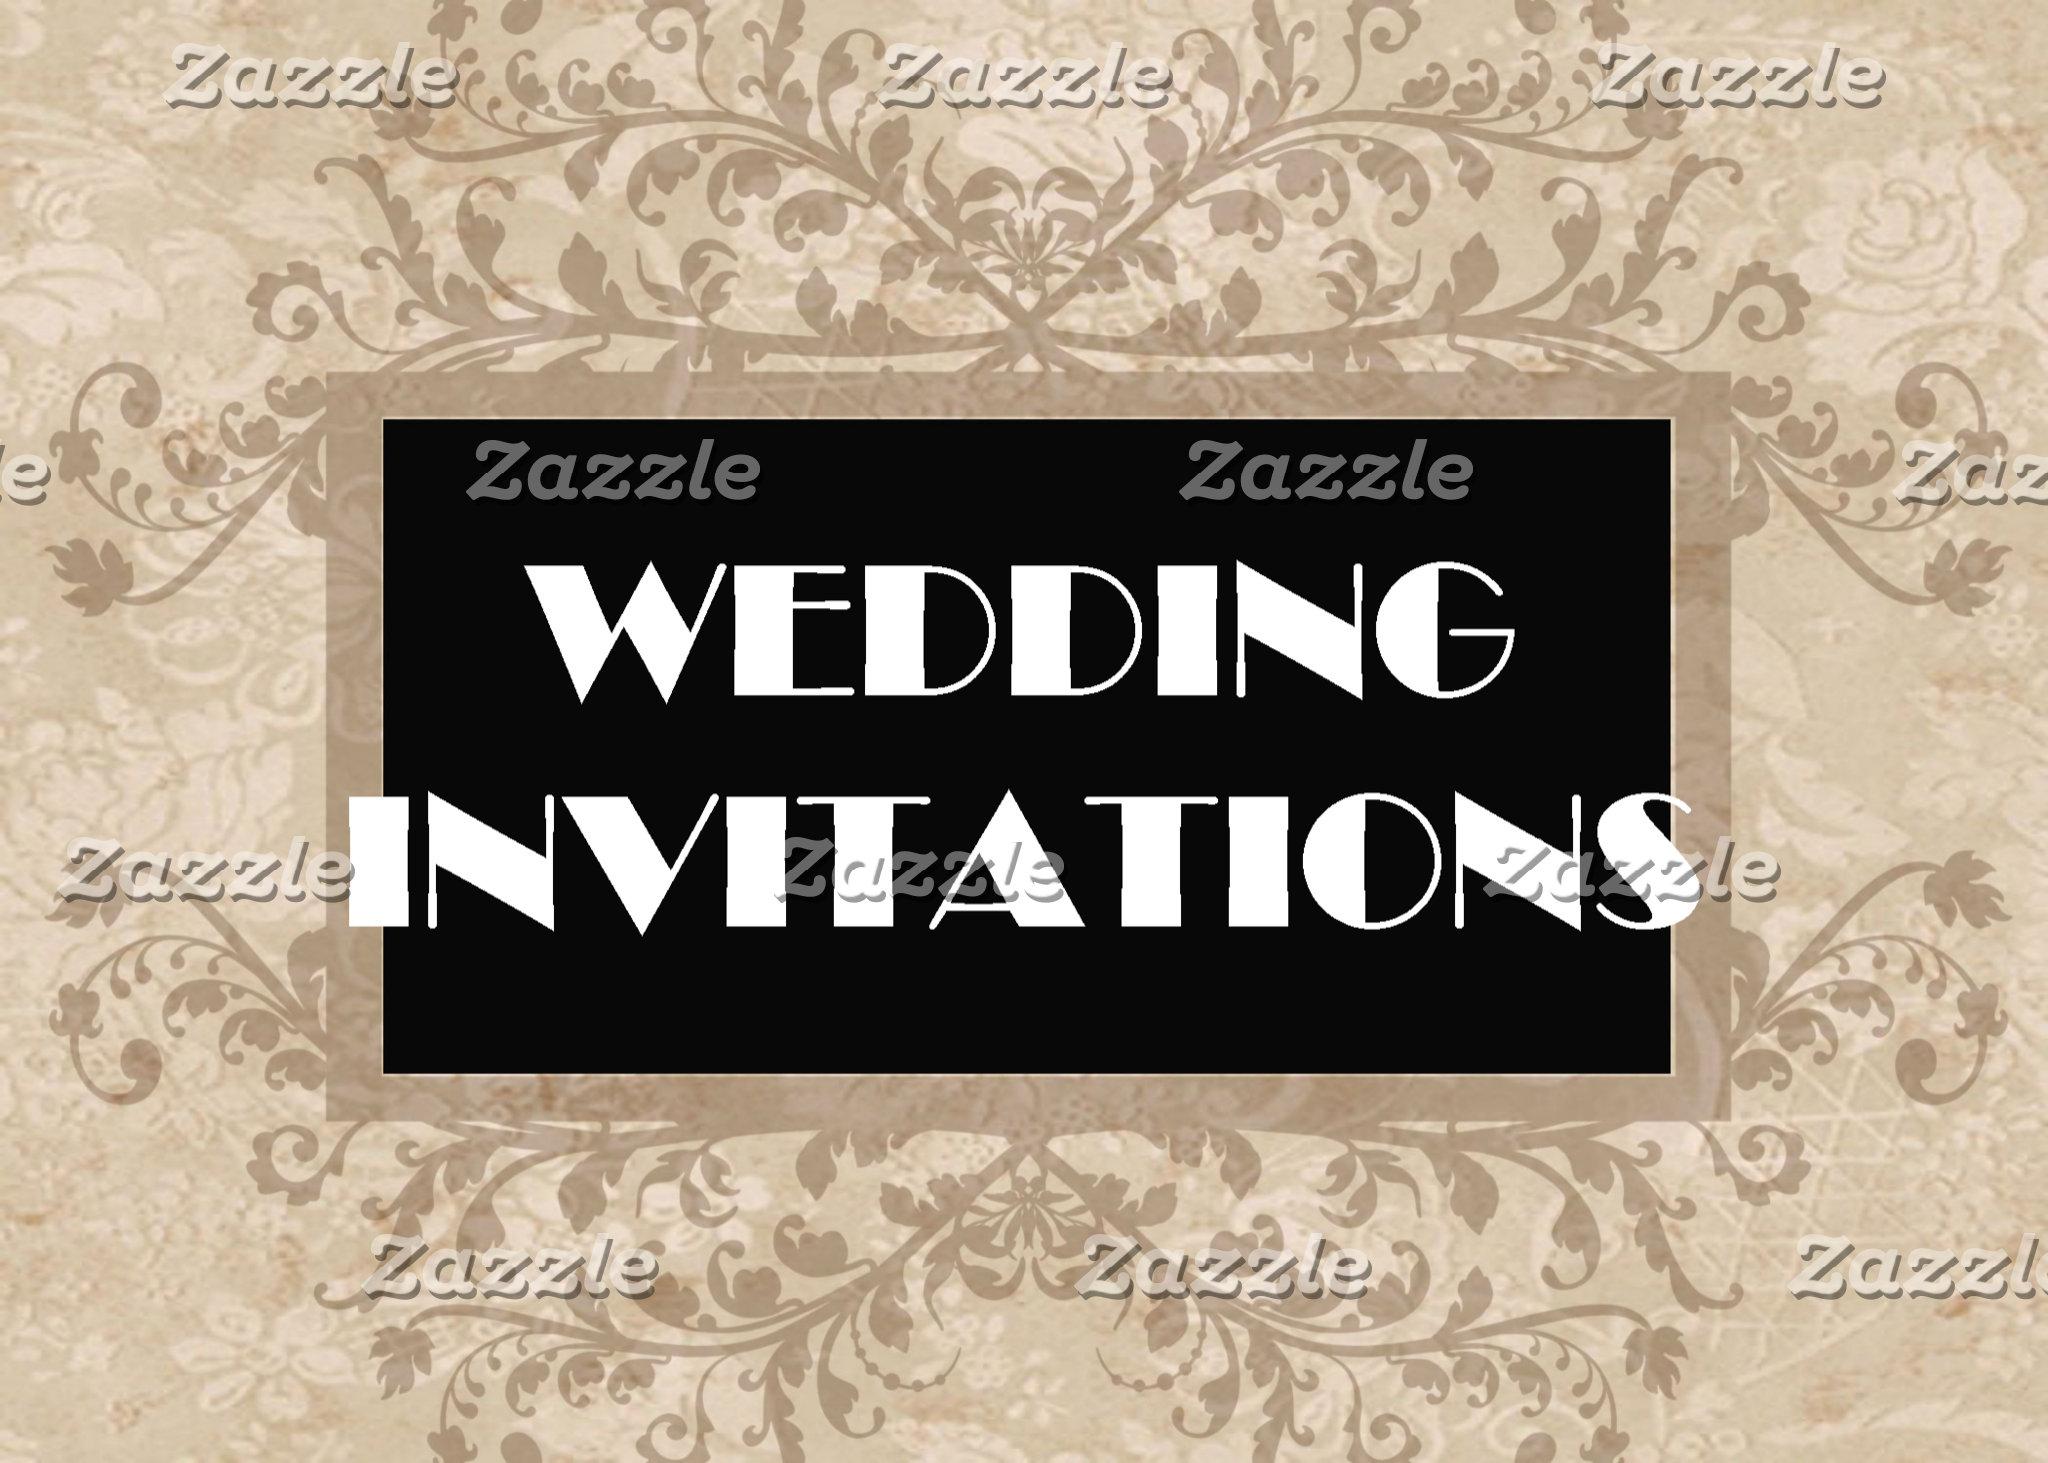 WEDDING INVITATIONS, LOVE IS LOVE